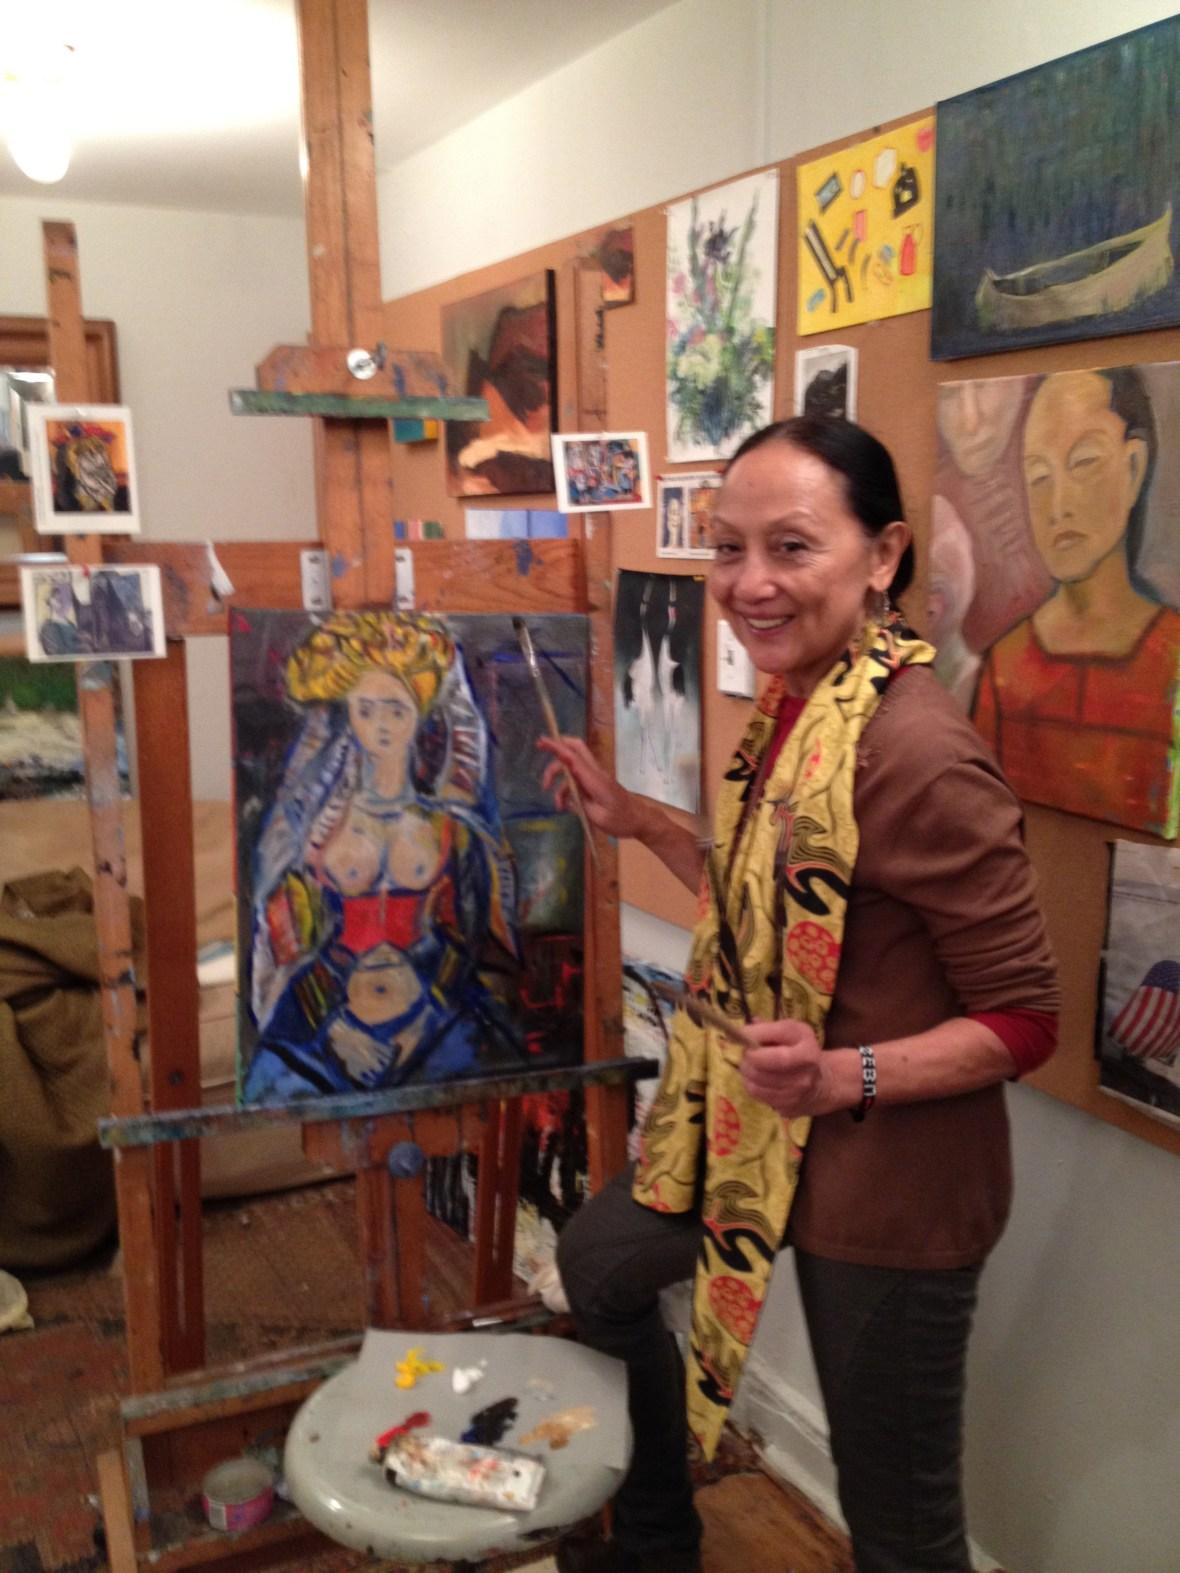 Ching Valdes Aran at work on a new painting | Photo courtesy of CVA